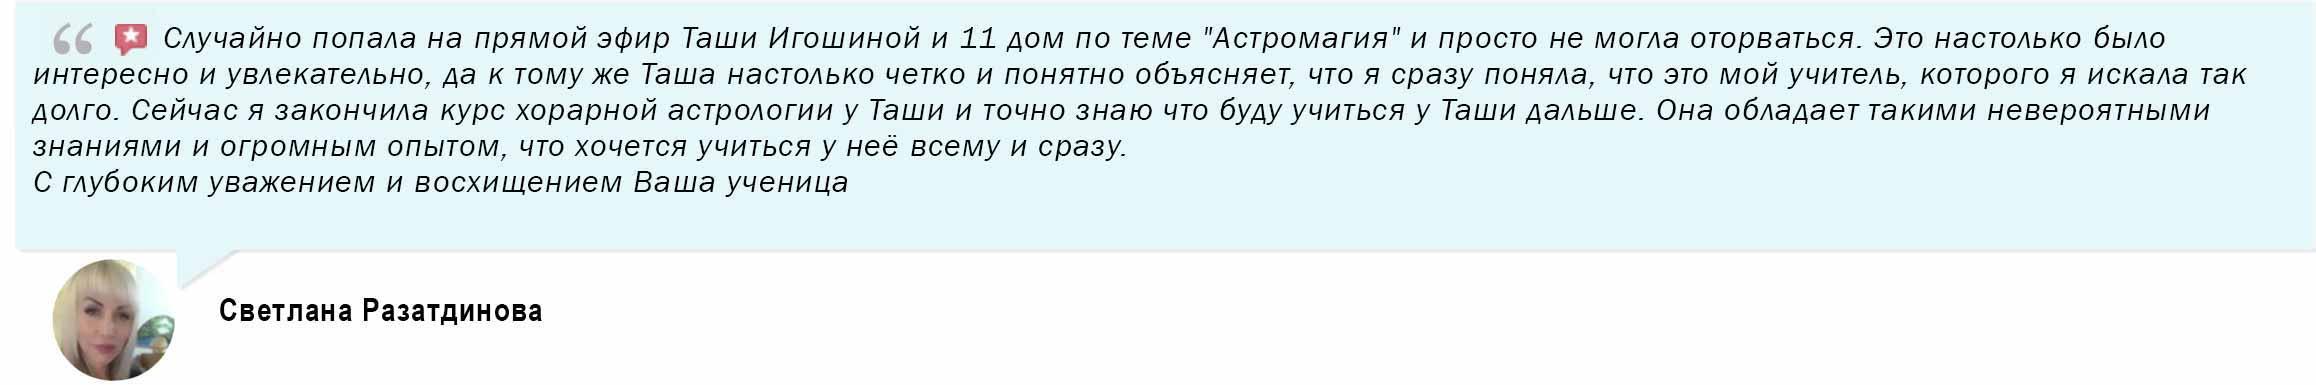 https://astrologtasha.ru/wp-content/uploads/2021/07/отзыв-Разатдинова.jpg